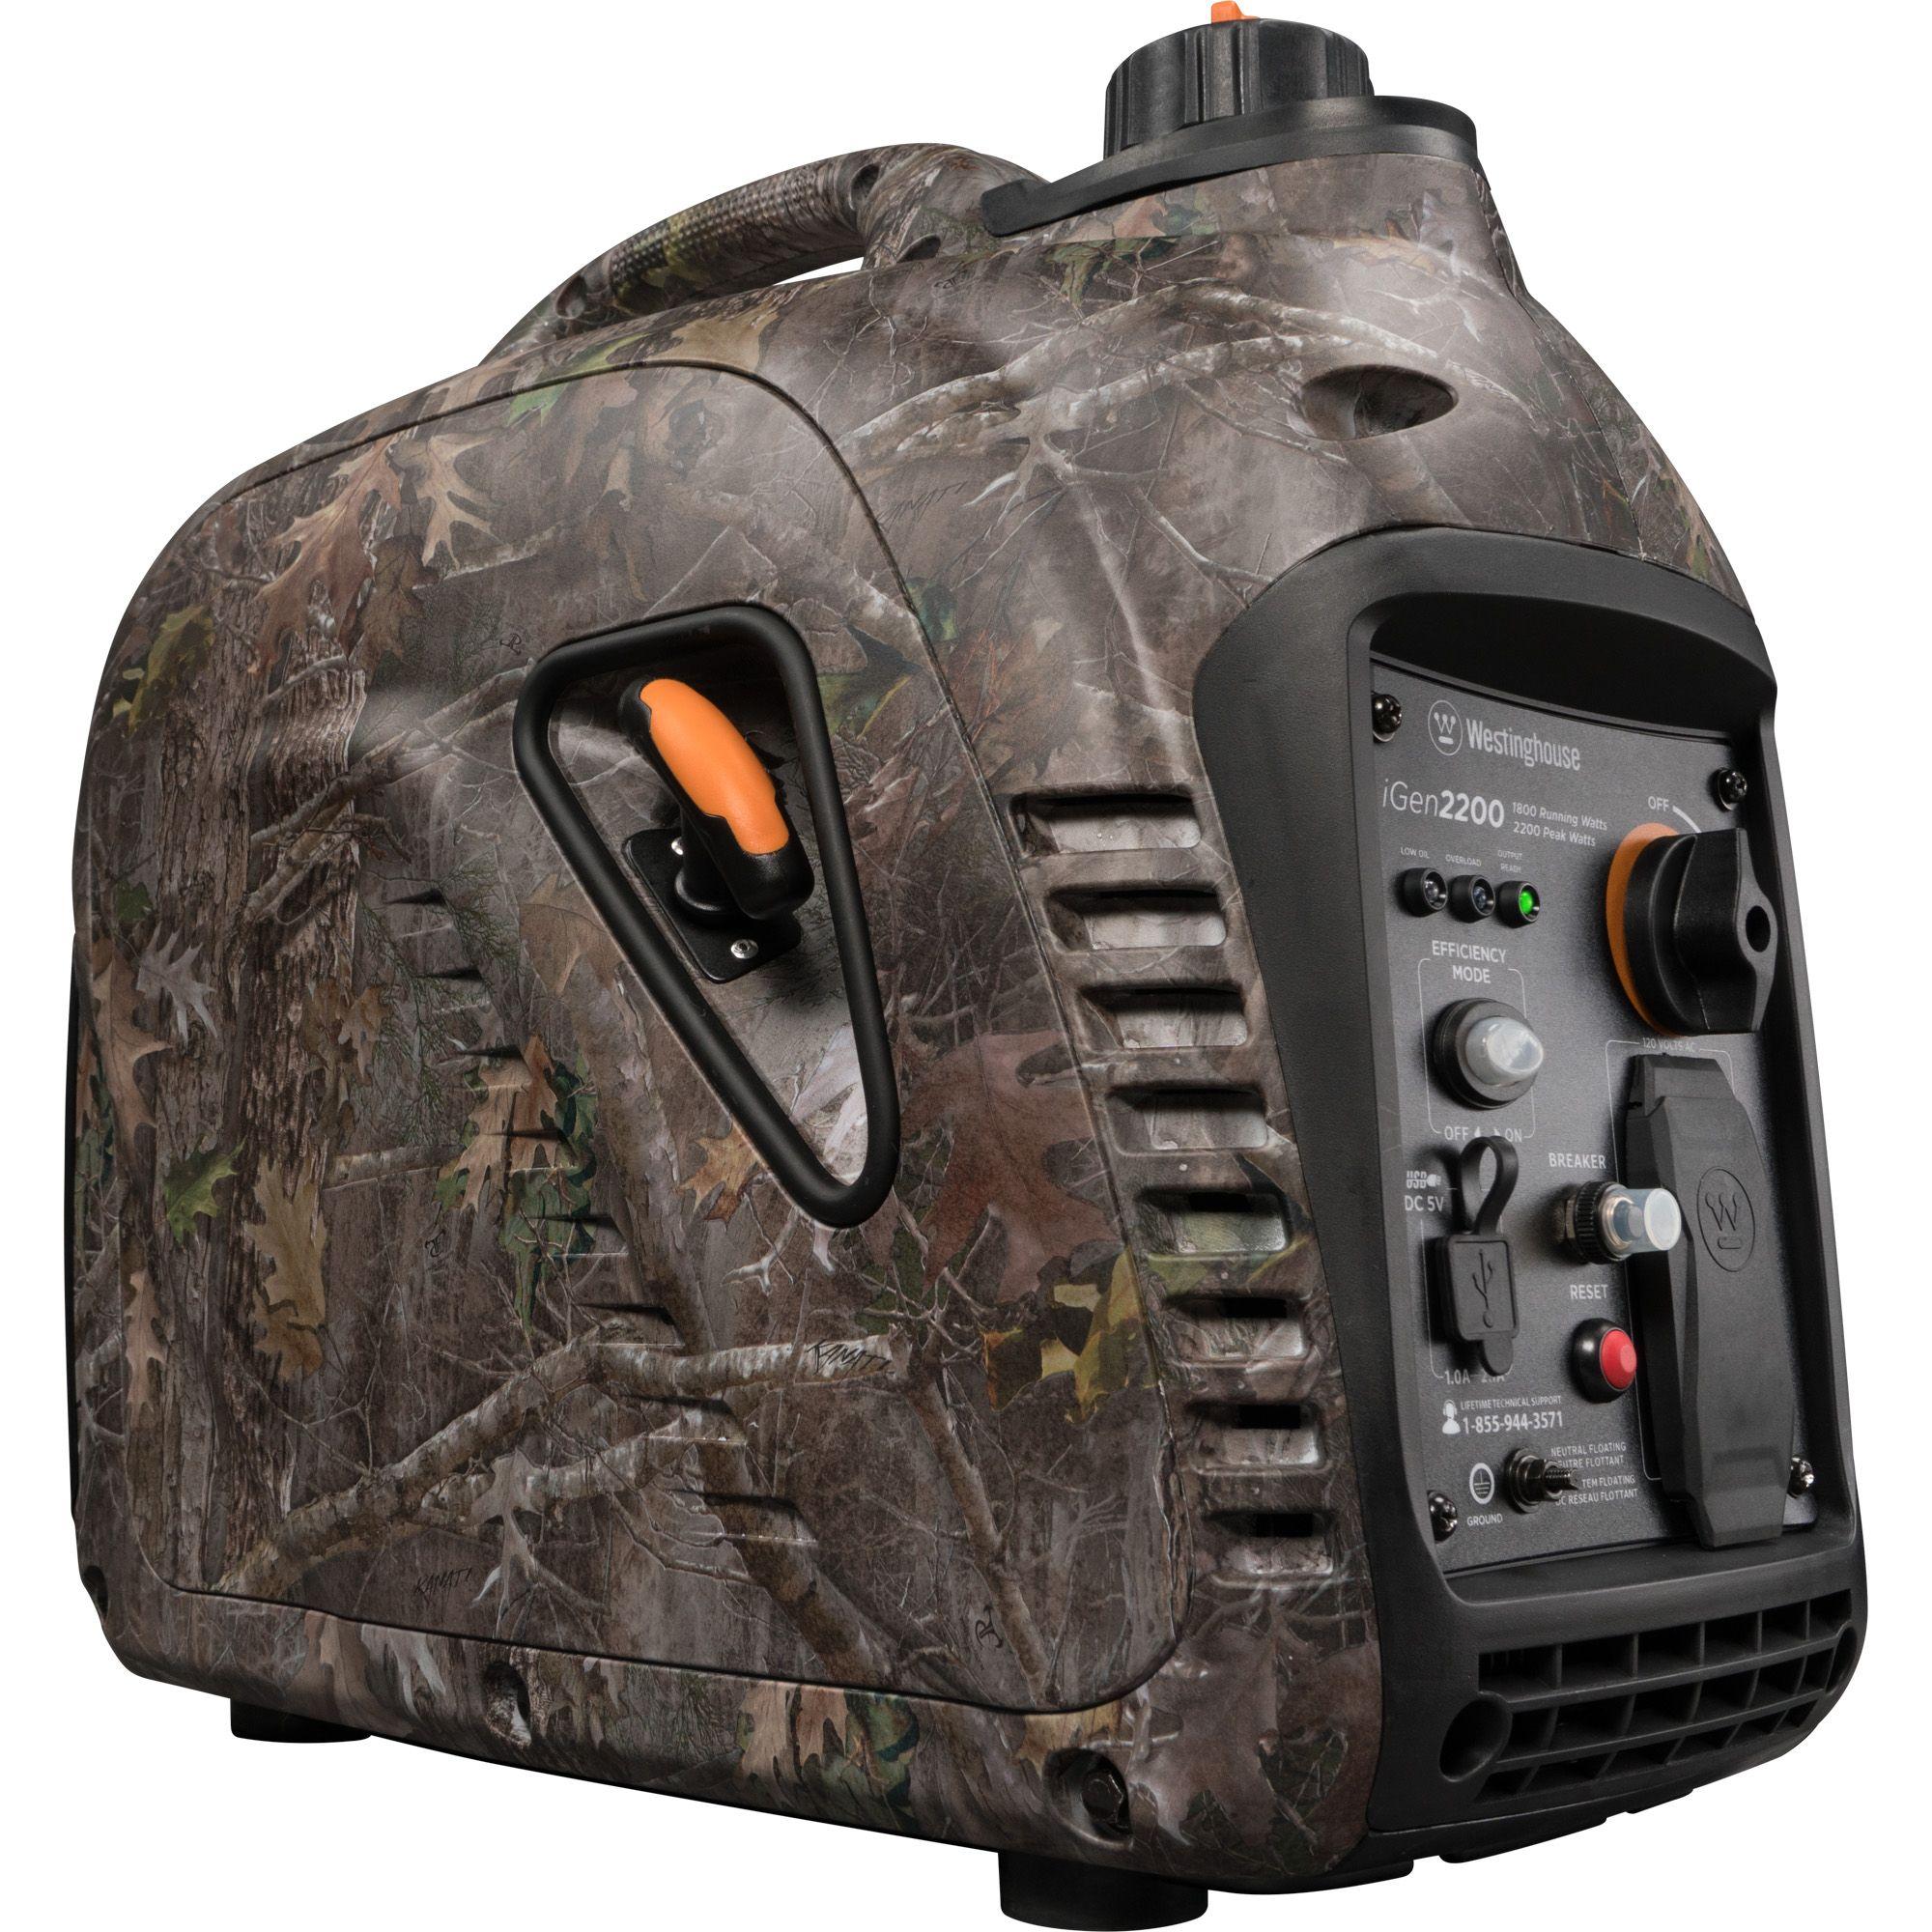 Westinghouse iGen2200 True Timber Camo Gas Powered Portable Inverter  Generator